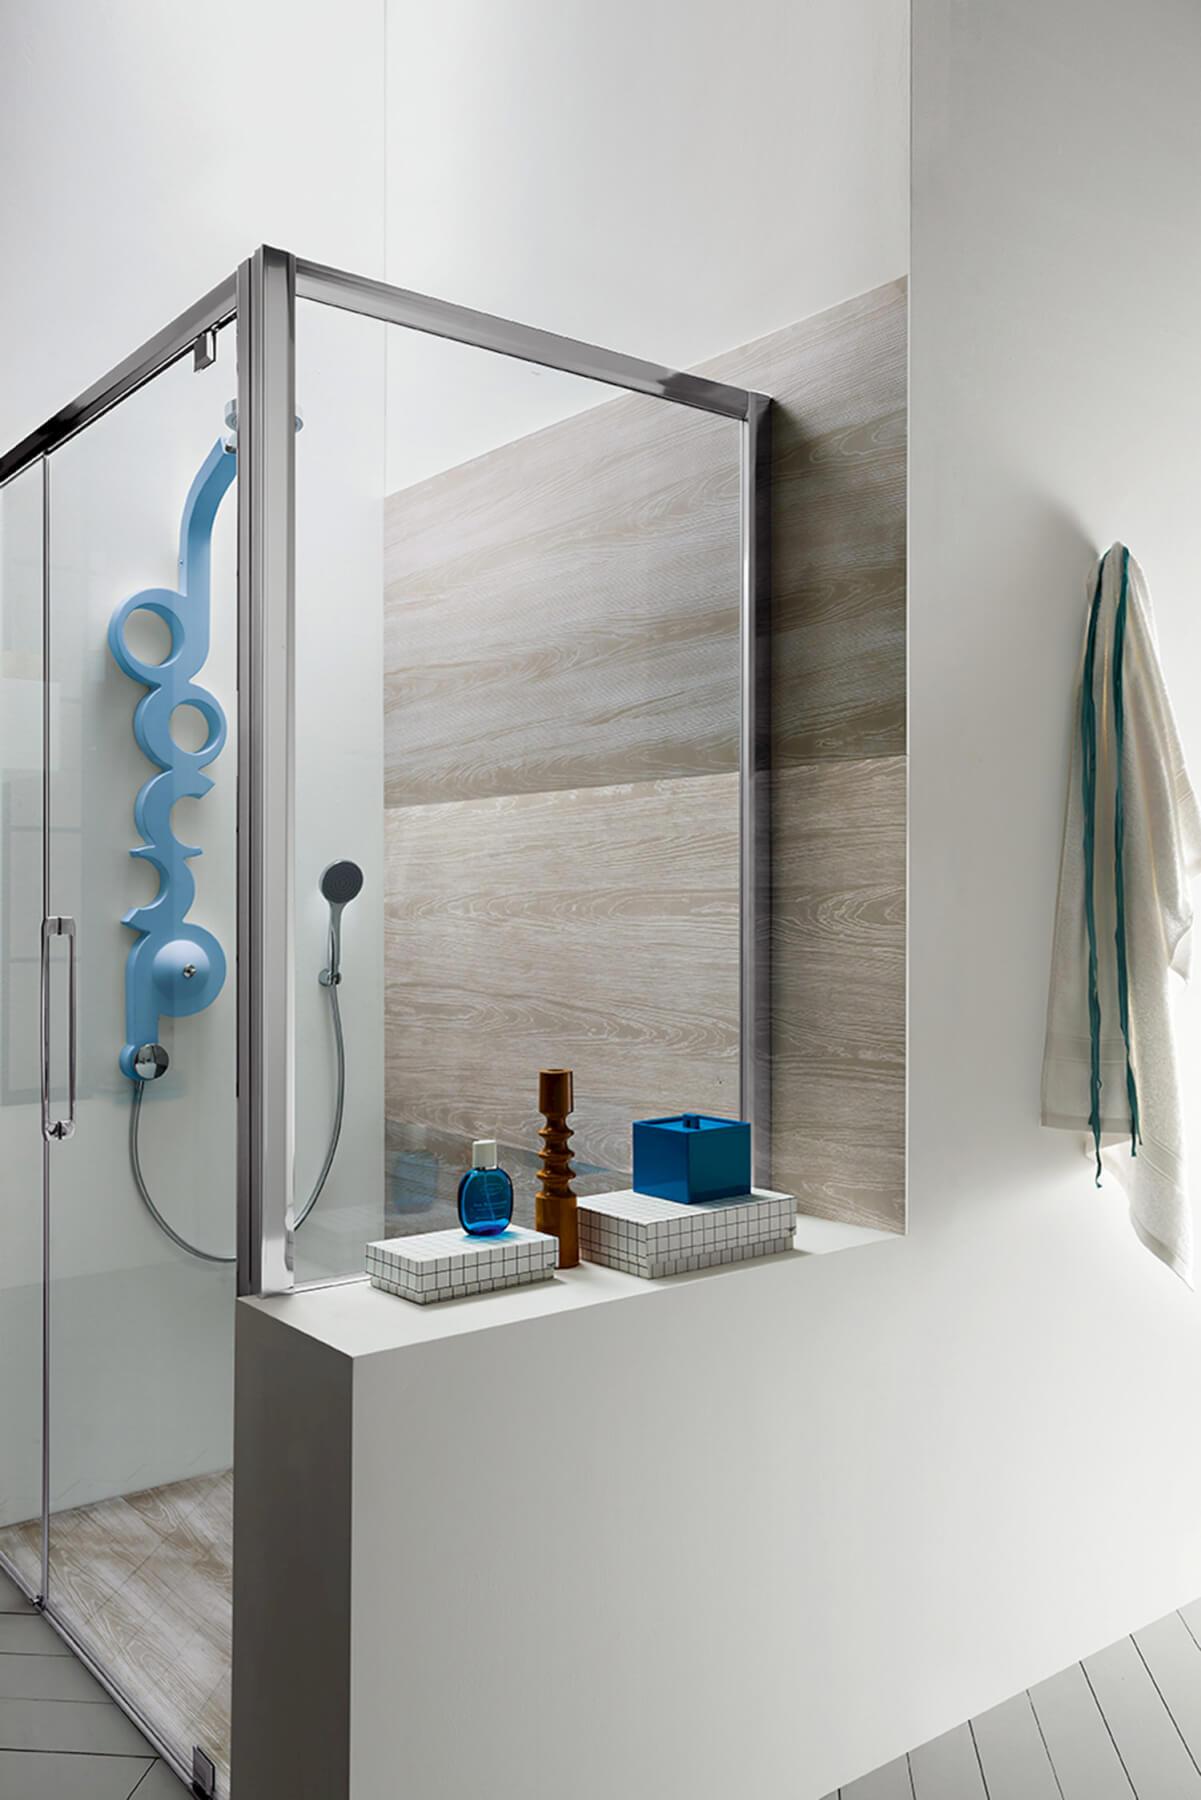 Zona doccia 351 artebagno for Arredo bagno como e provincia